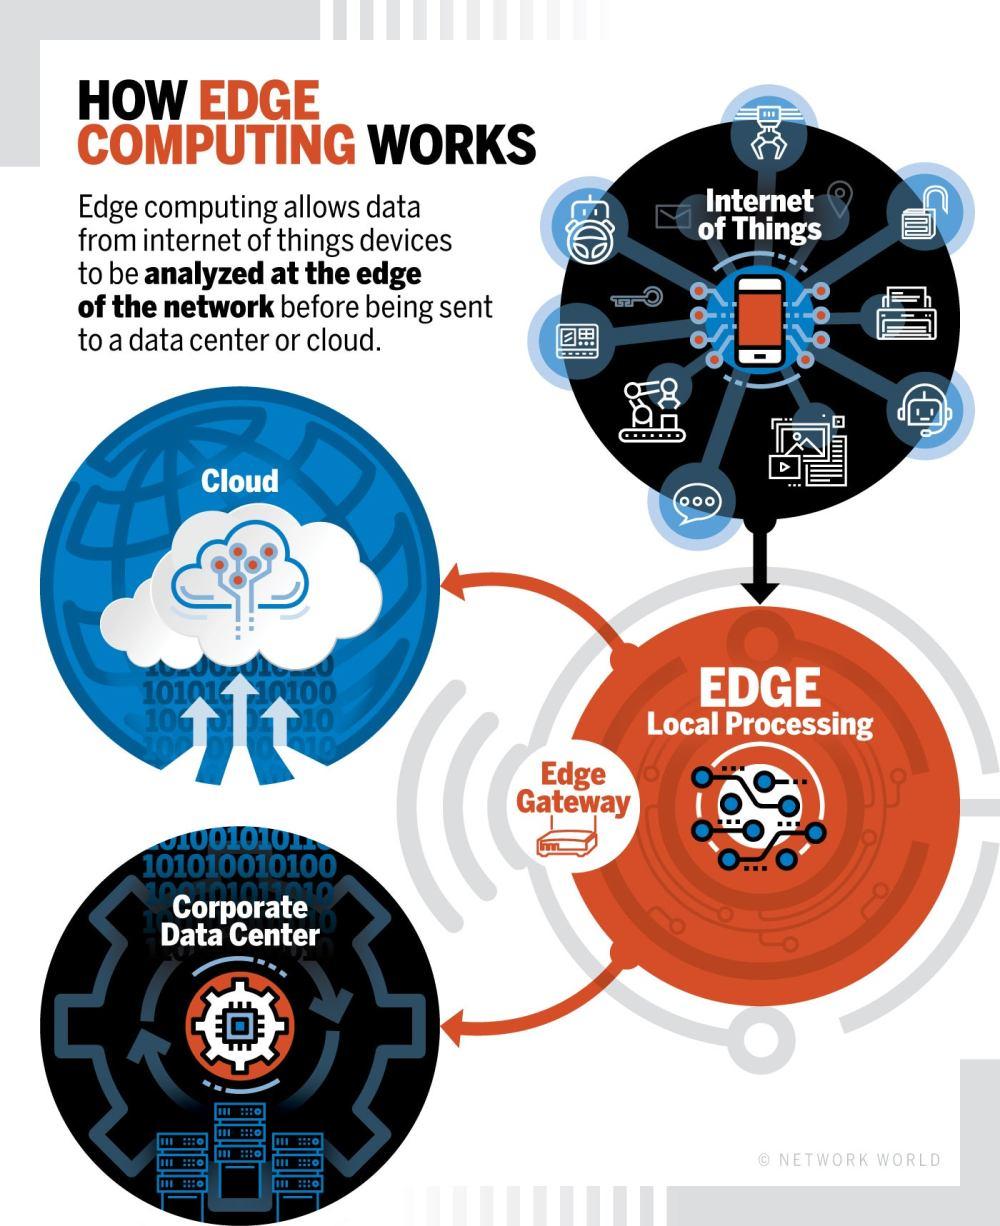 medium resolution of network world how edge computing works diagram